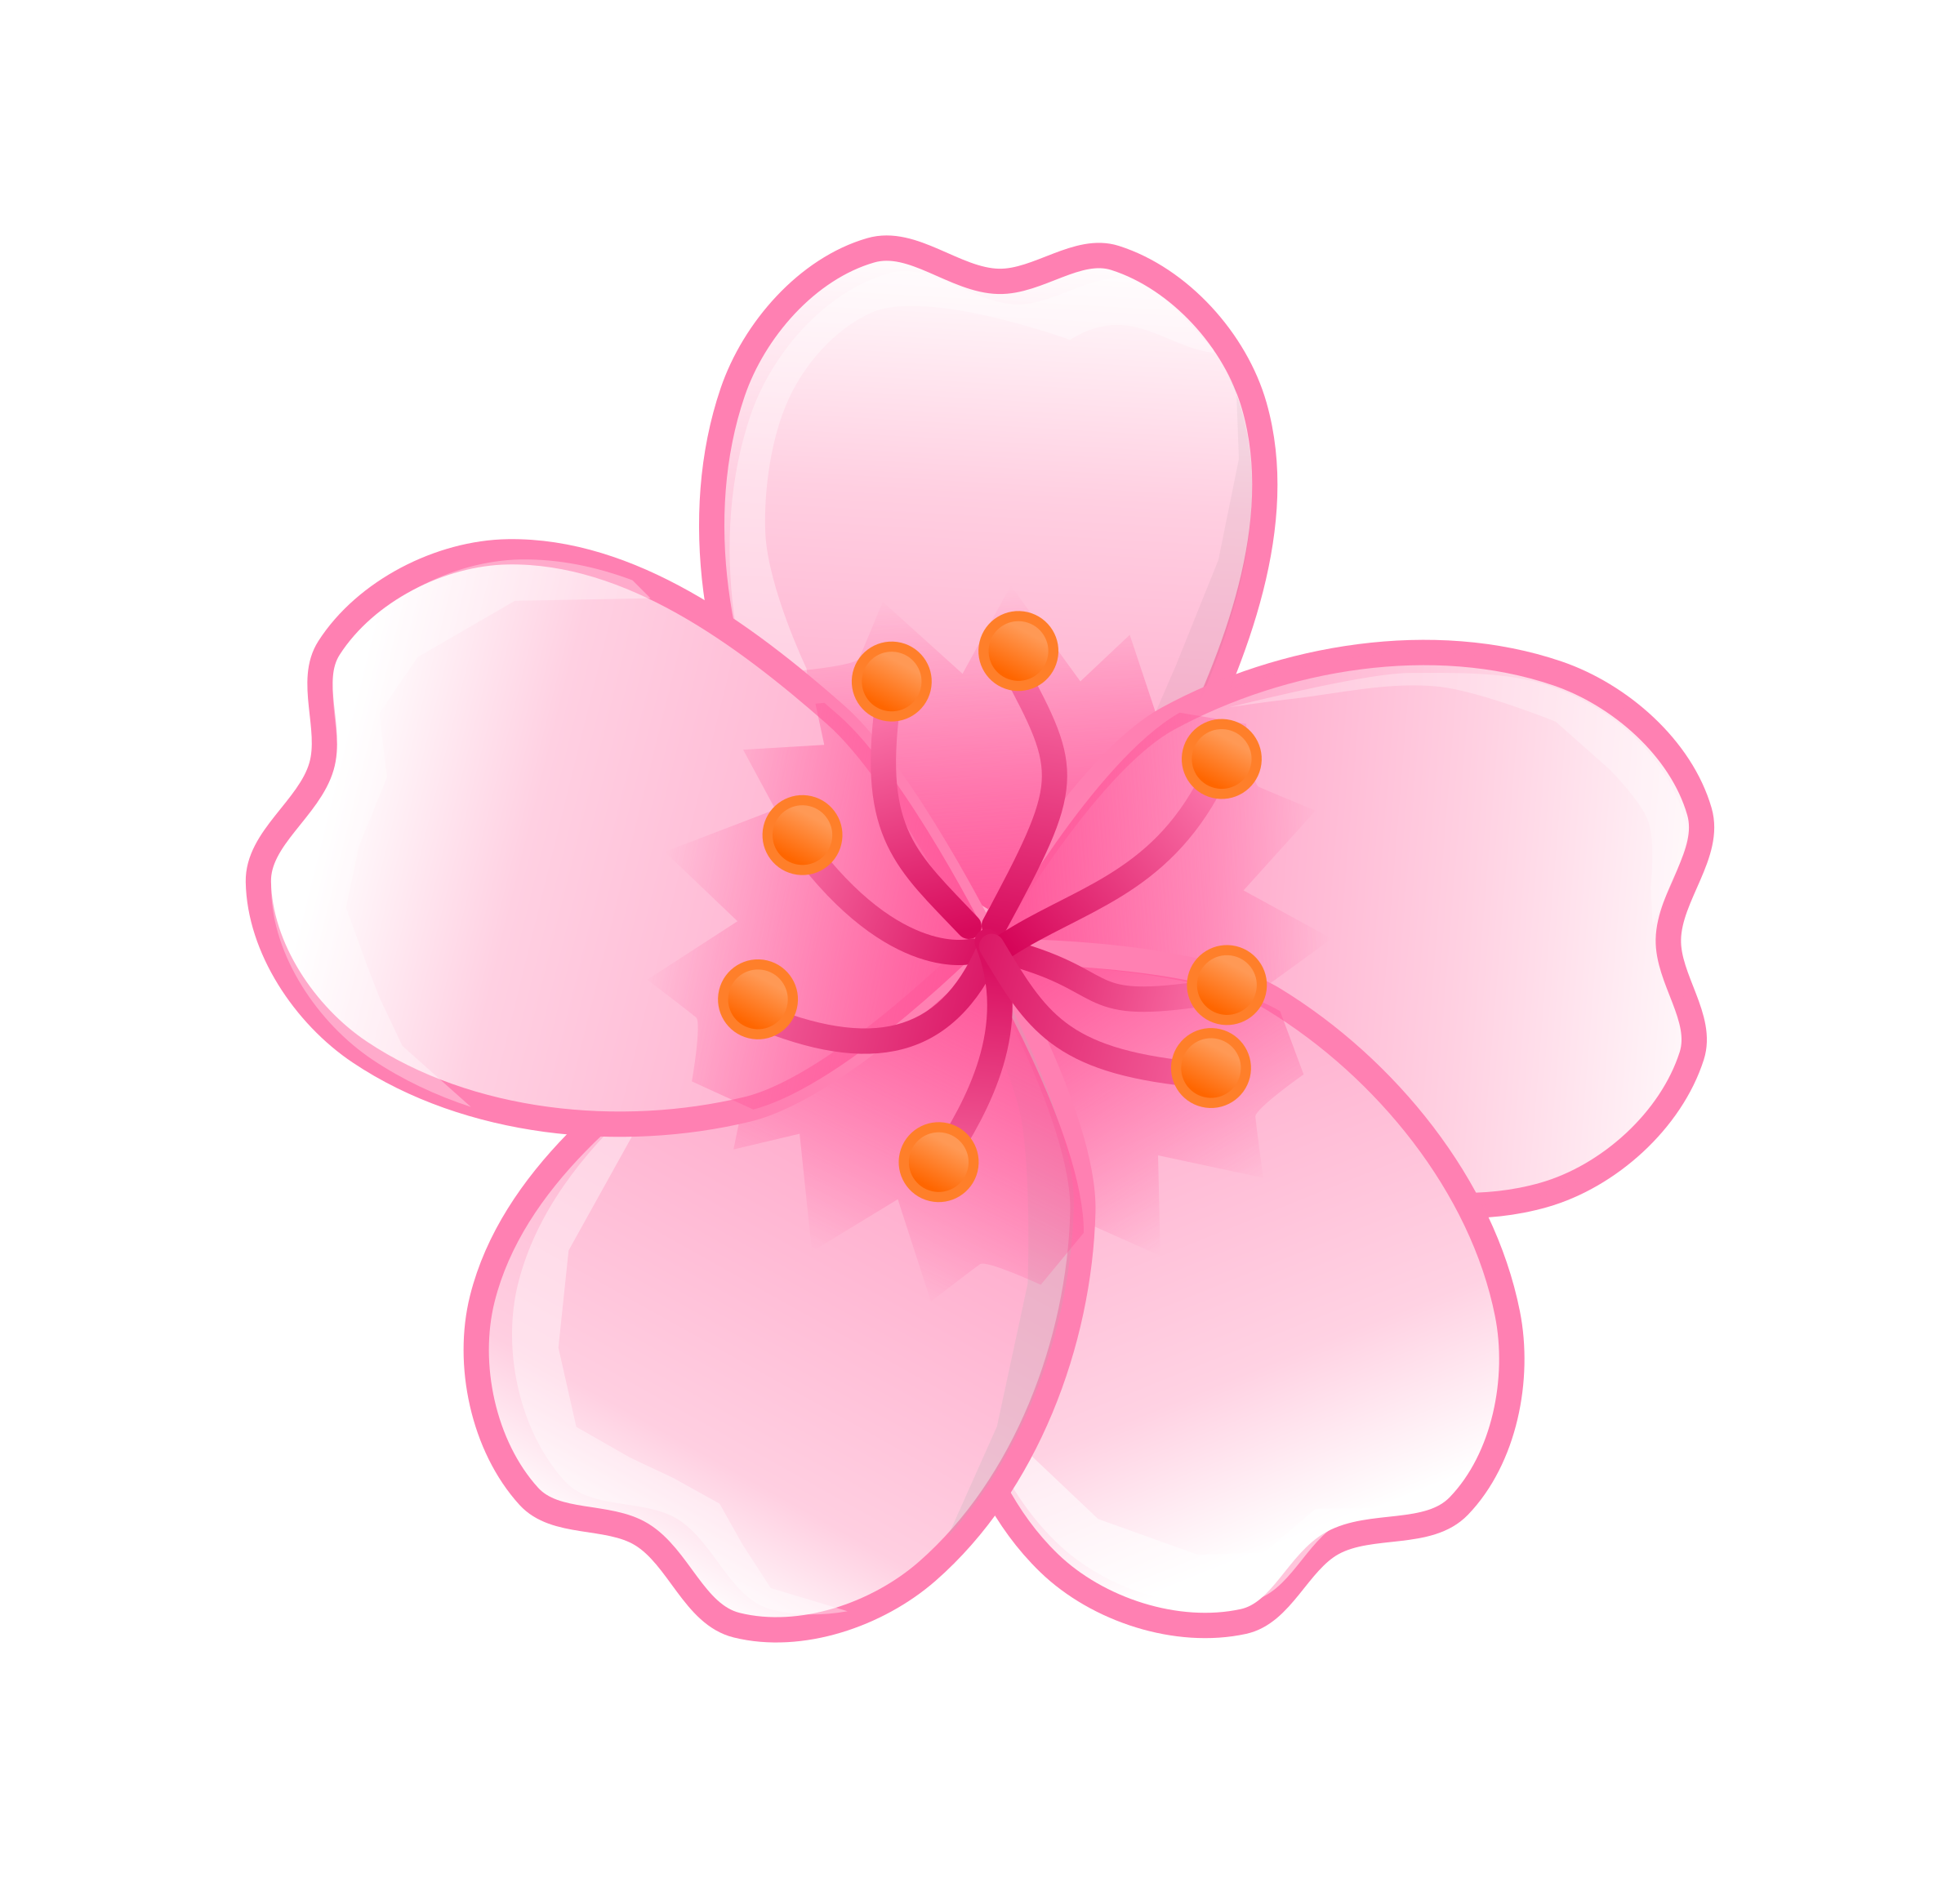 Free cartoon flower clipart clip art freeuse download Sakura flower clipart png - ClipartFest clip art freeuse download